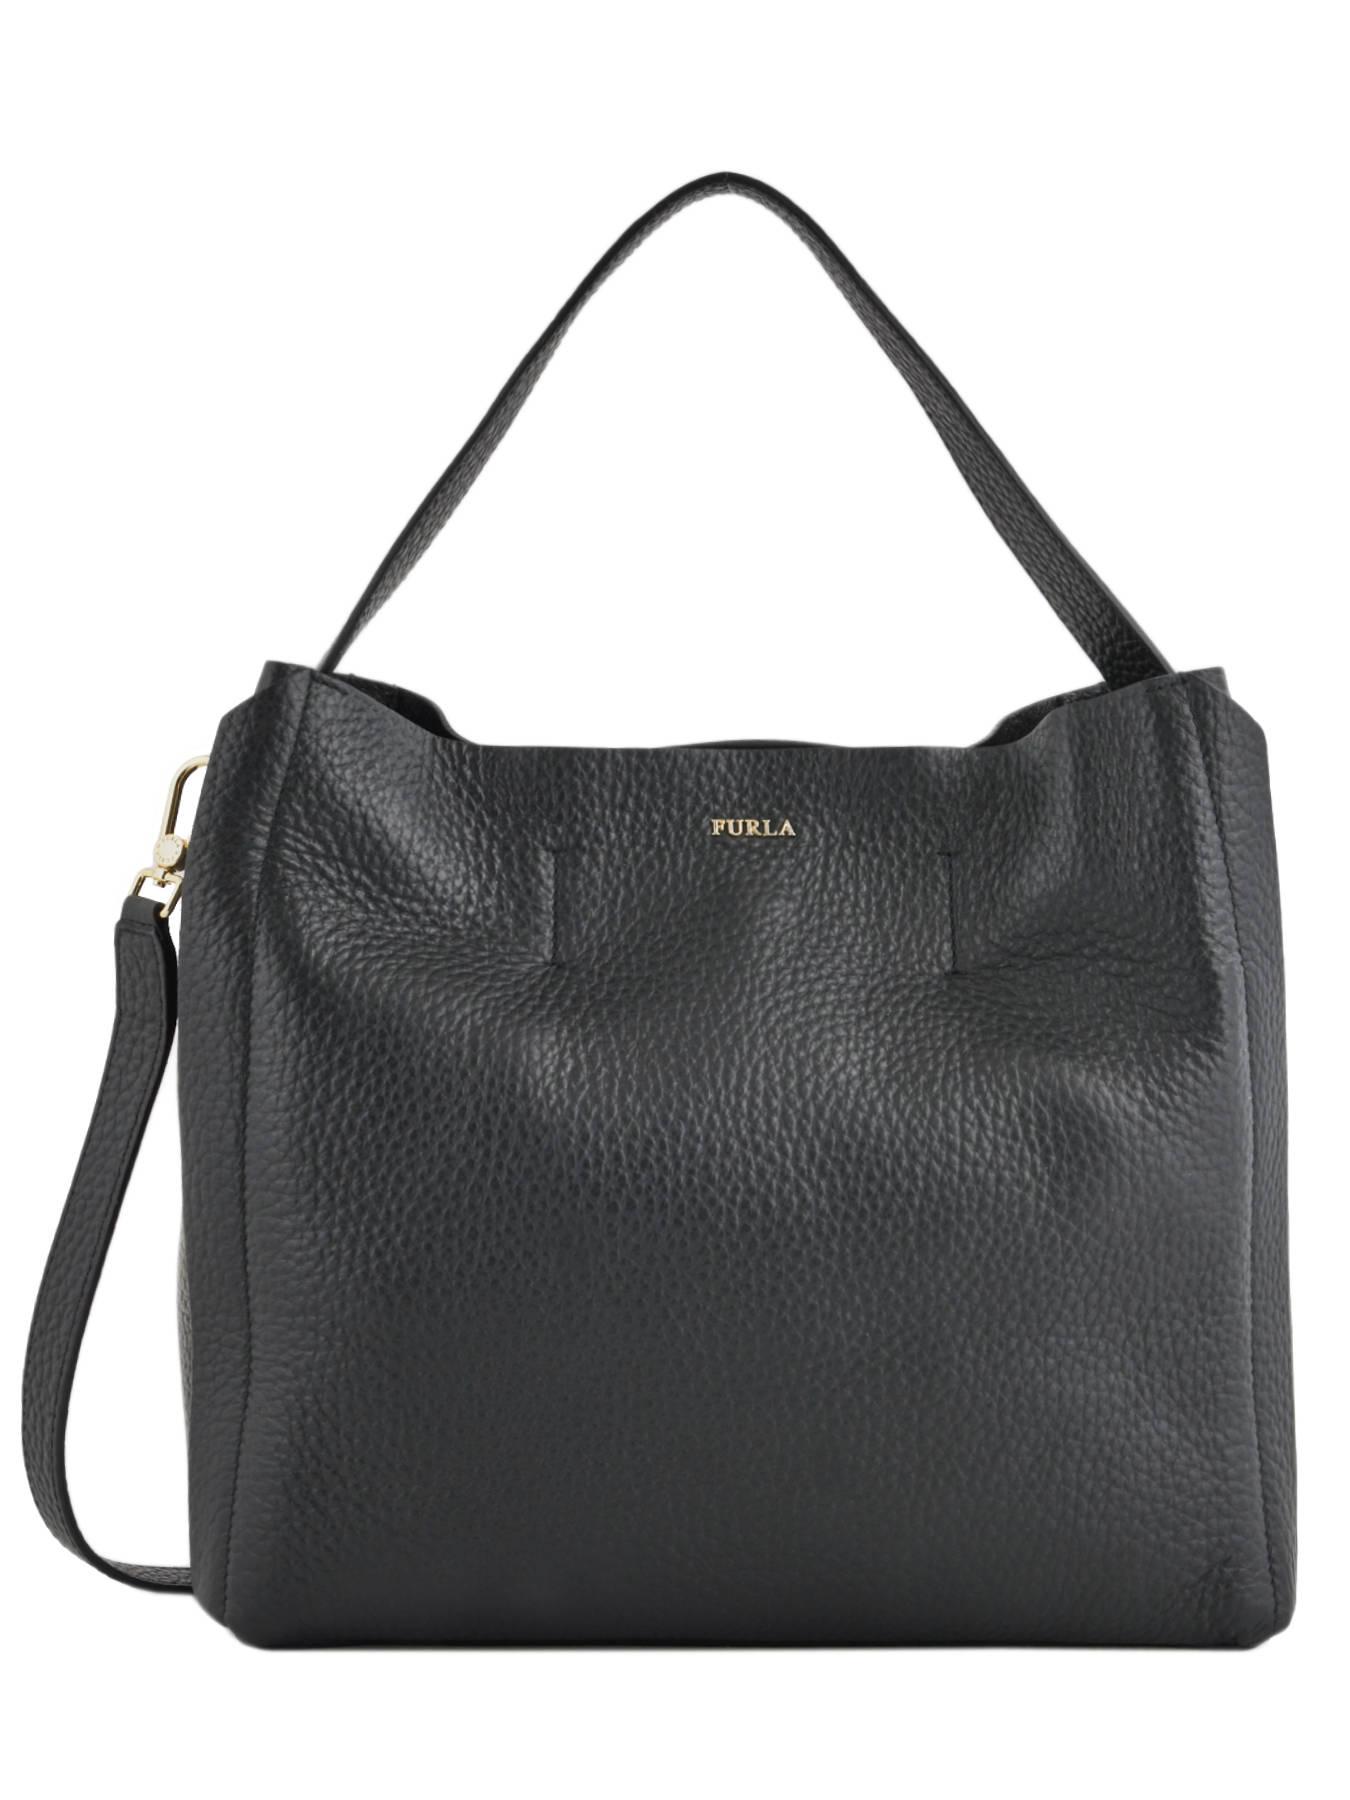 b7e946feda ... Hobo Bag Capriccio Leather Furla Black capriccio LN2-BHE6 ...